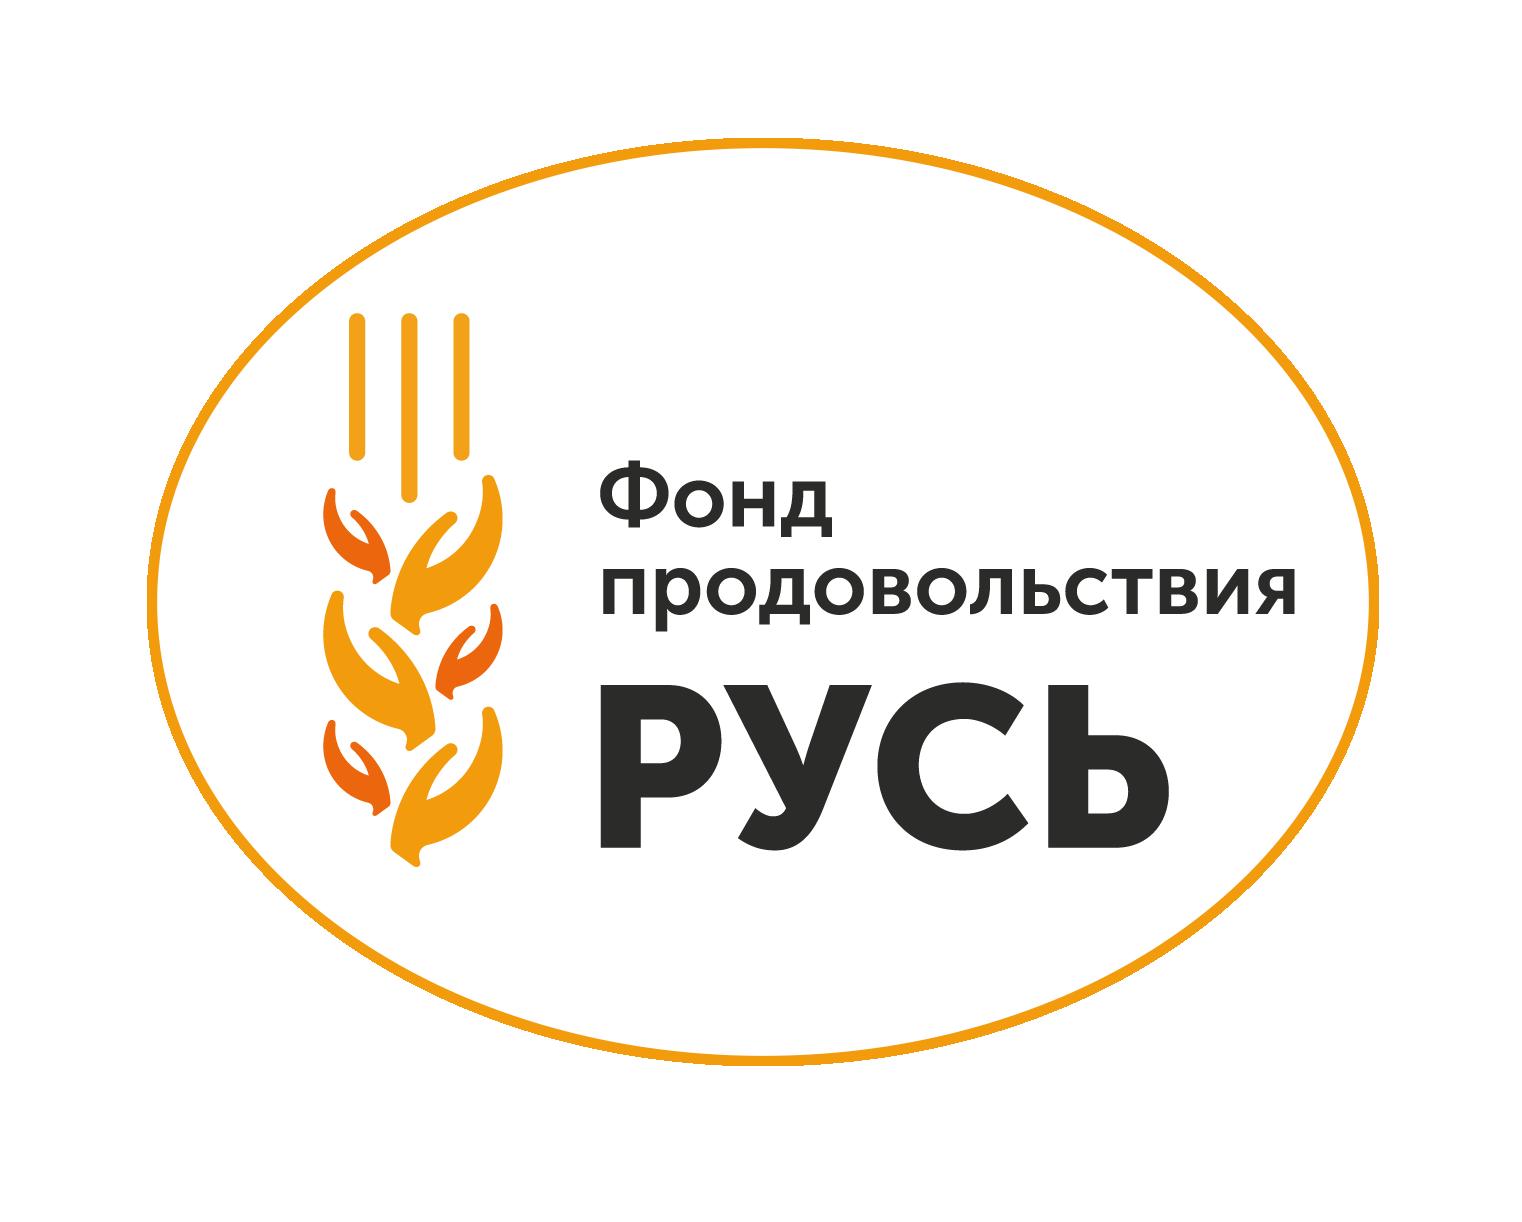 Fond_Rus_logo  в круге